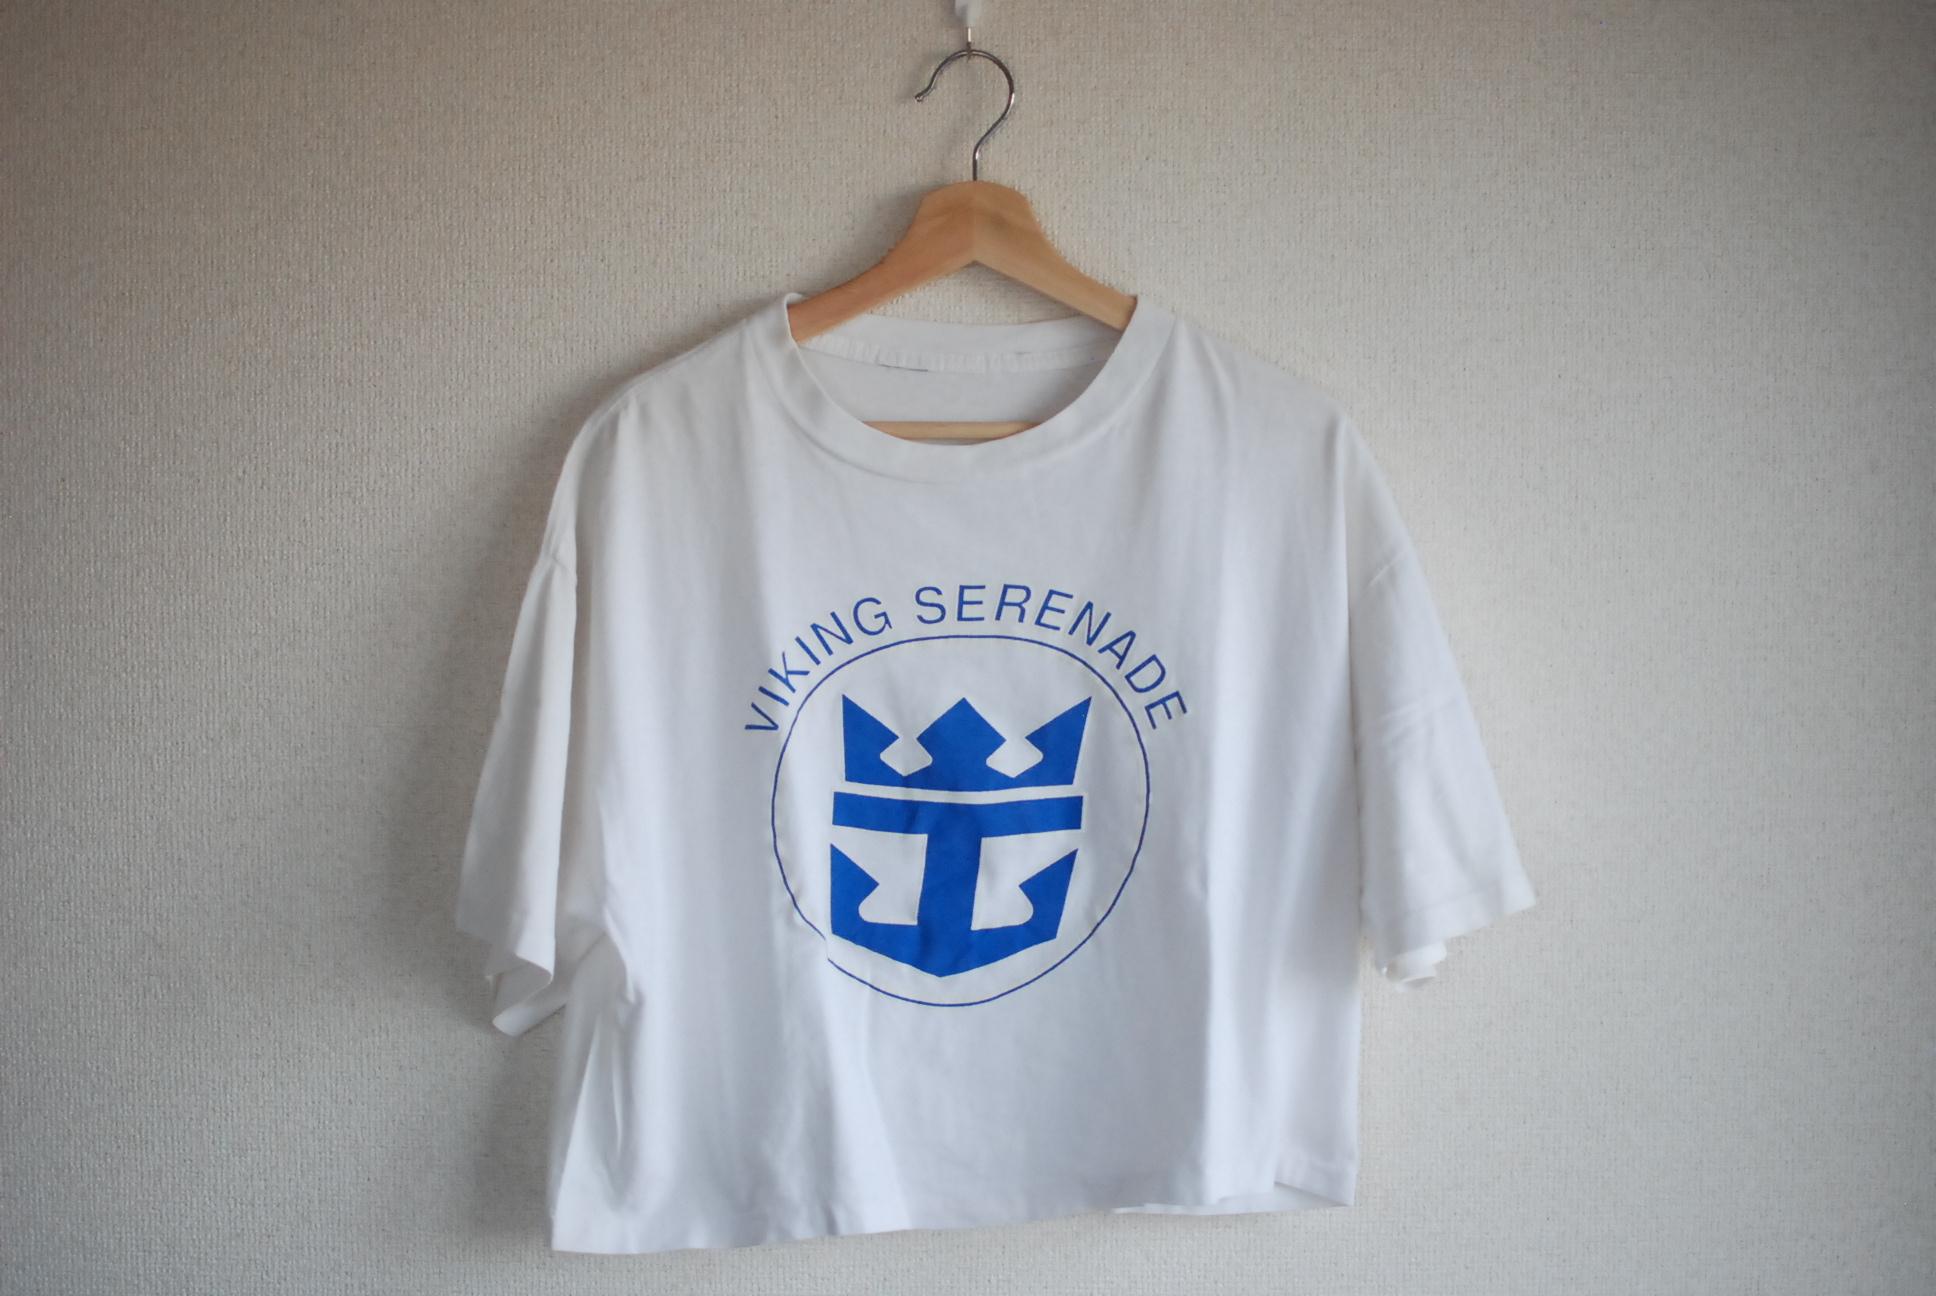 【WOMEN'S】USED 90's Crop T-shirt